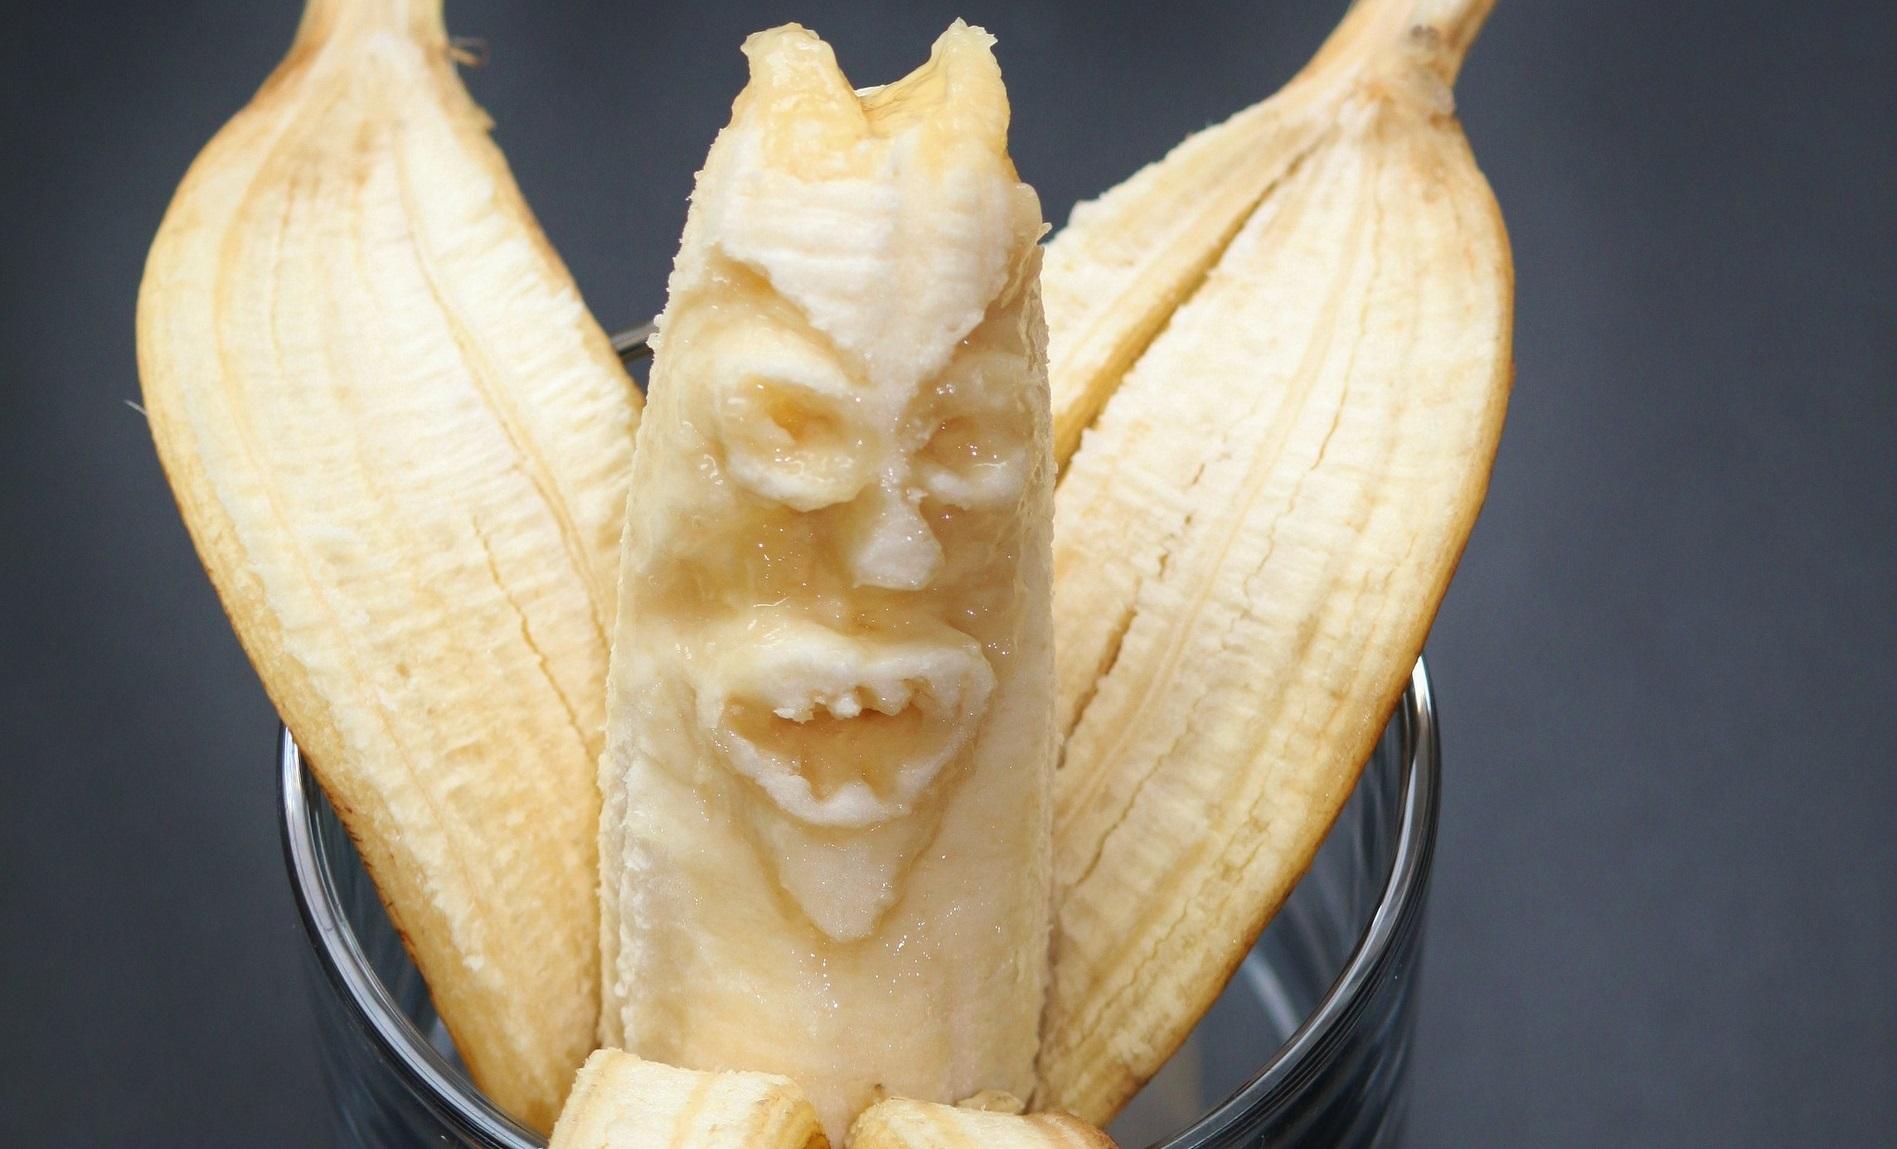 banana eksperiment